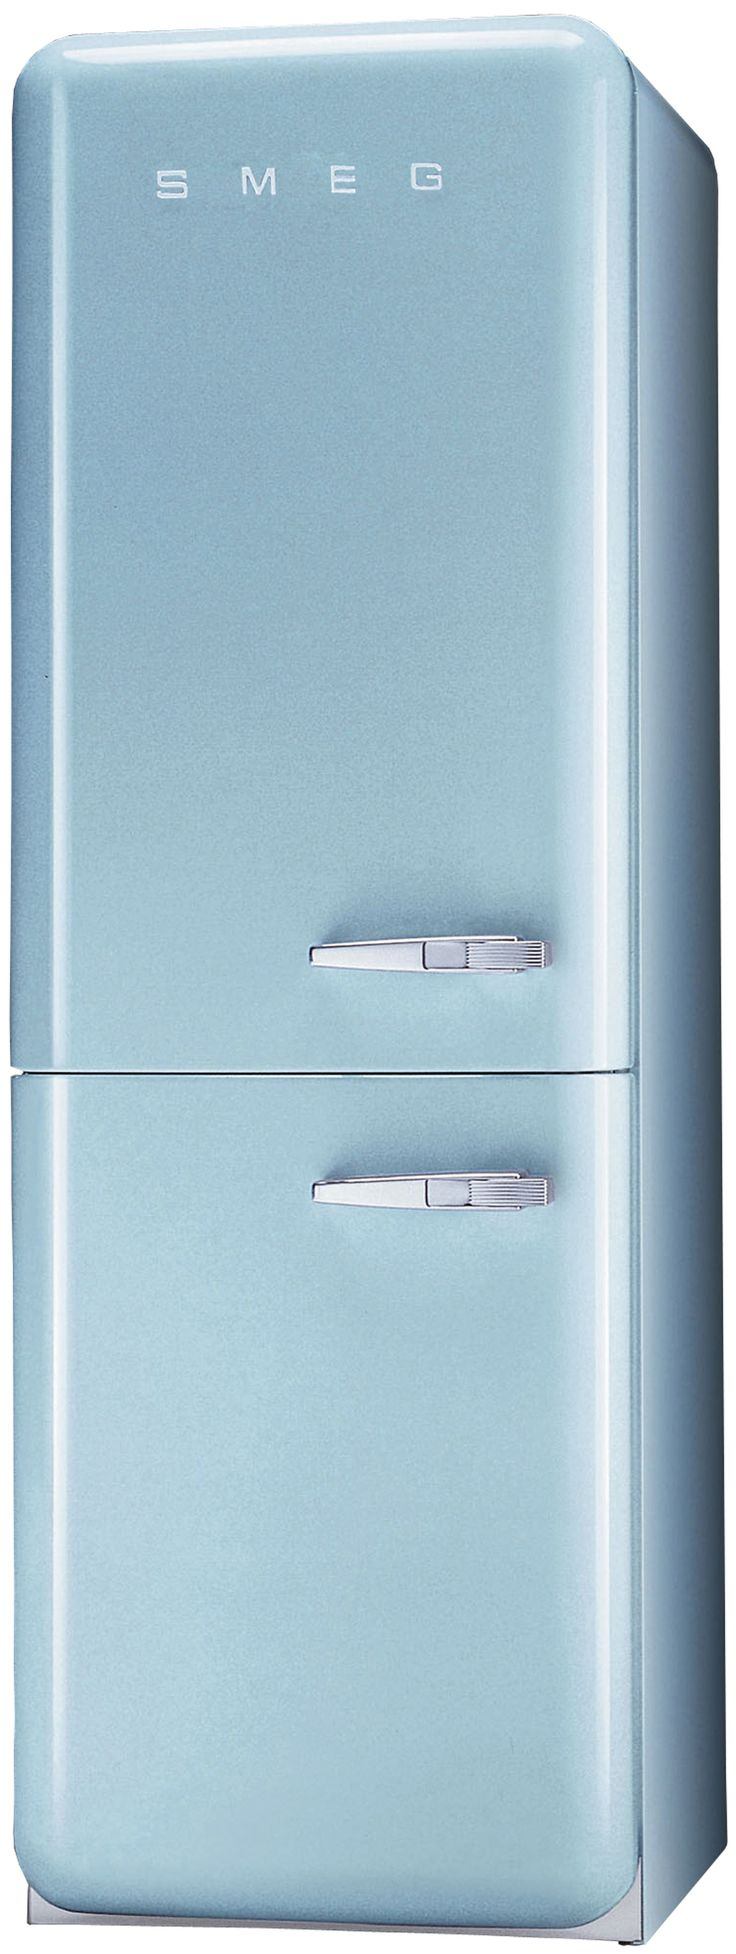 Upscale Kitchen Appliances 17 Best Ideas About Kitchen Appliance Packages On Pinterest